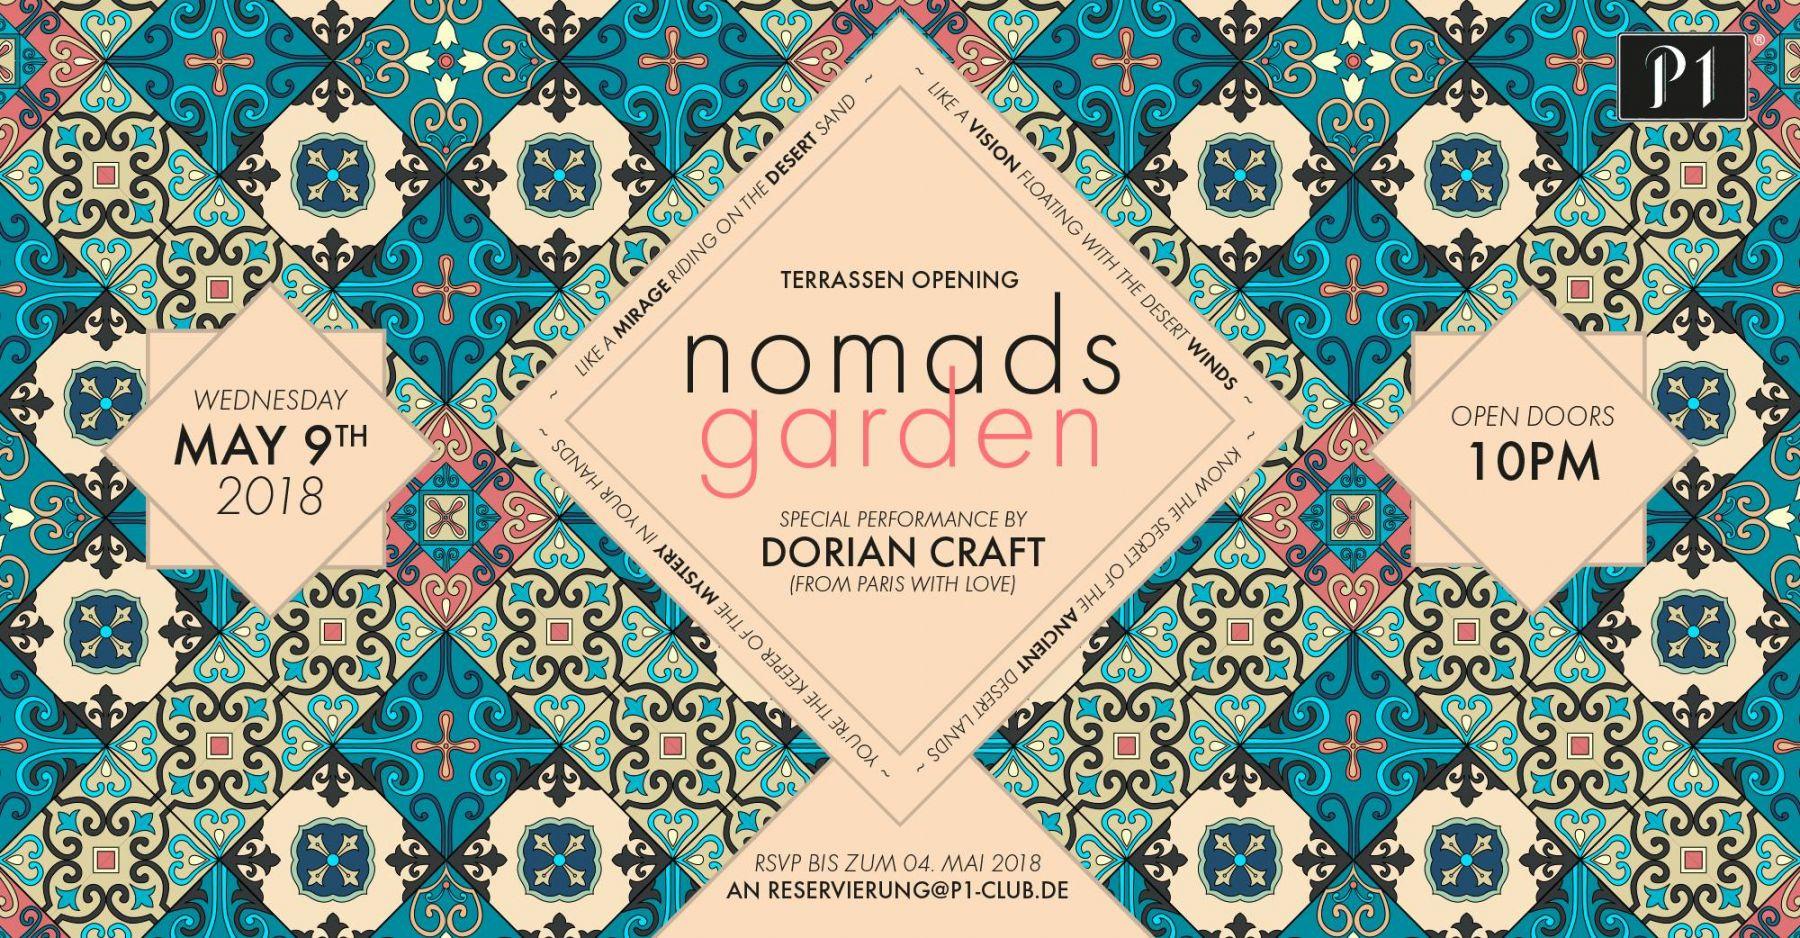 p1 terrassen opening nomads garden p1 club bar events m nchen. Black Bedroom Furniture Sets. Home Design Ideas